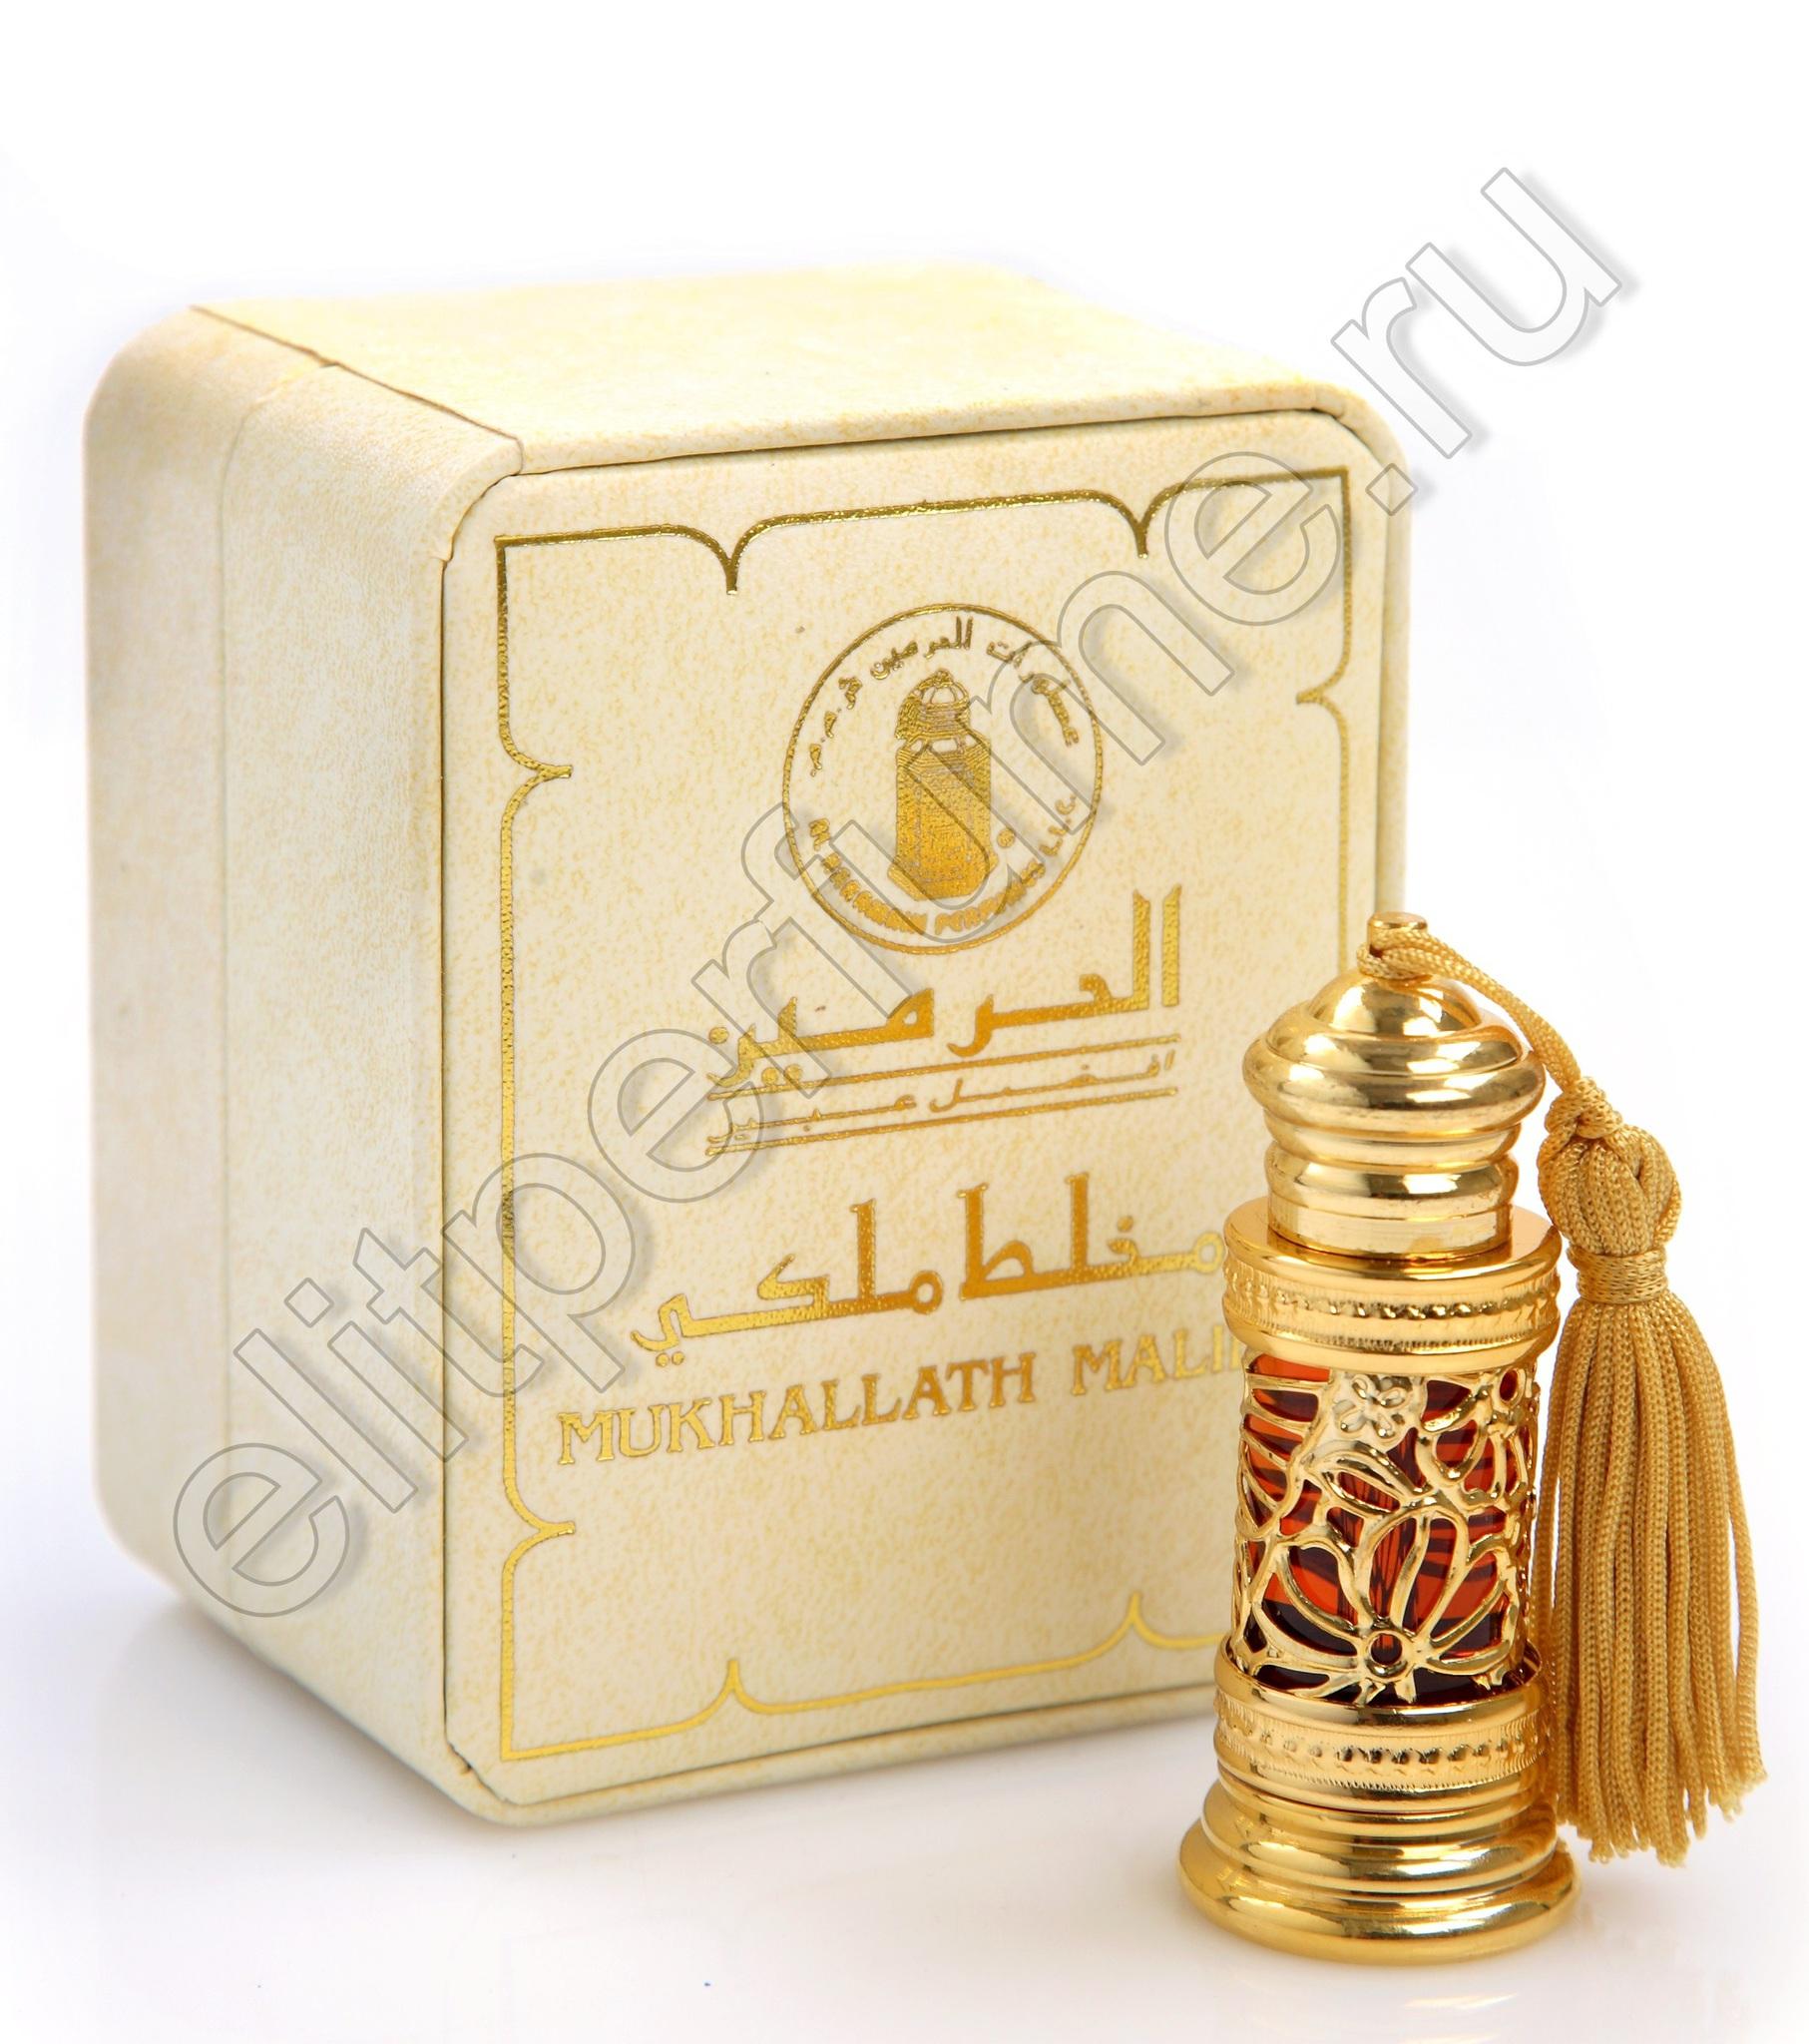 Пробники для духов Мухаллат Малики Mukhallath Maliki 1 мл арабские масляные духи от Аль Харамайн Al Haramin Perfumes